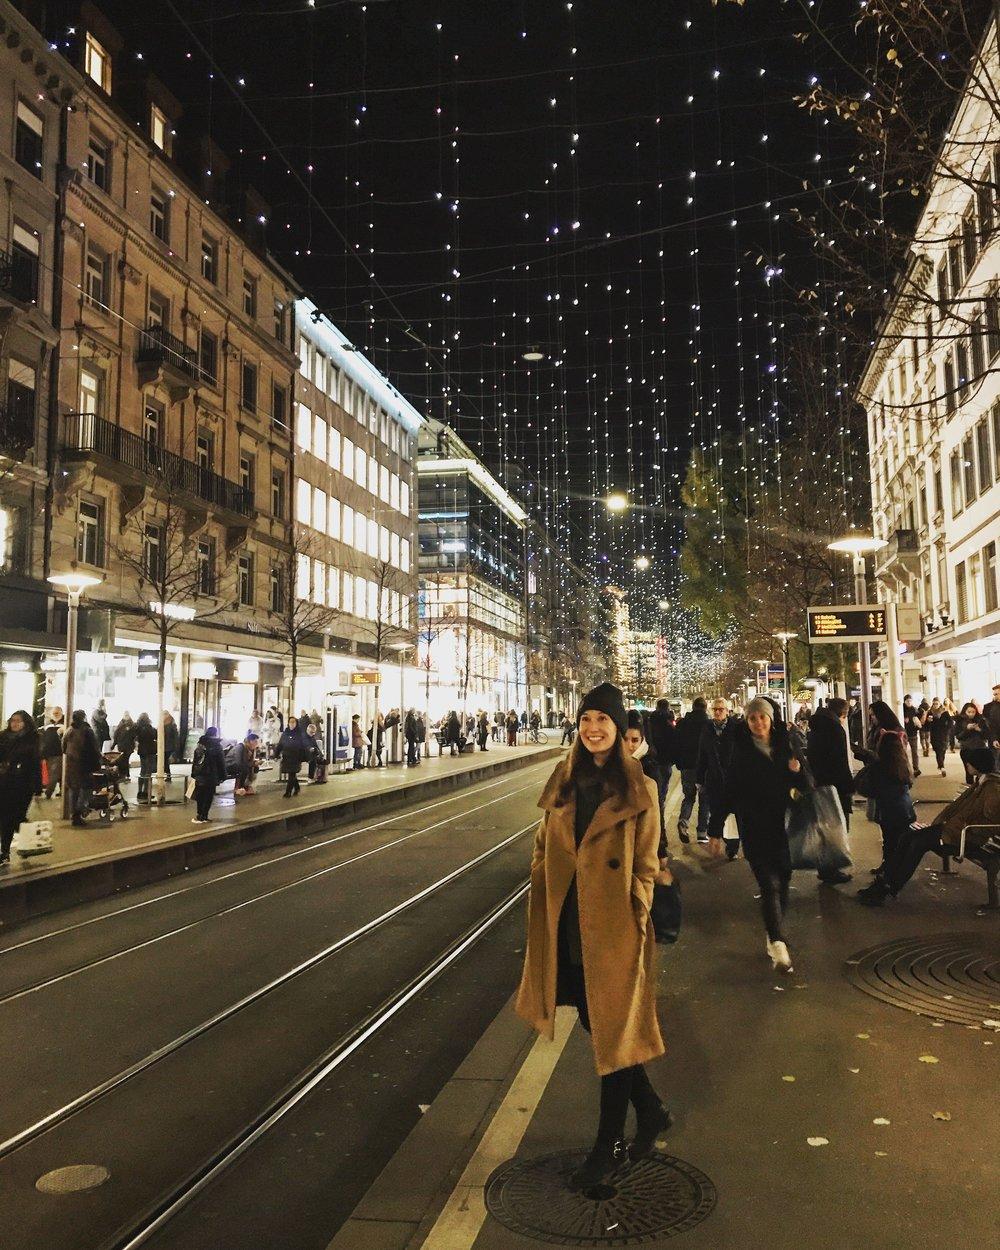 Lucy lights on Banhofstrasse